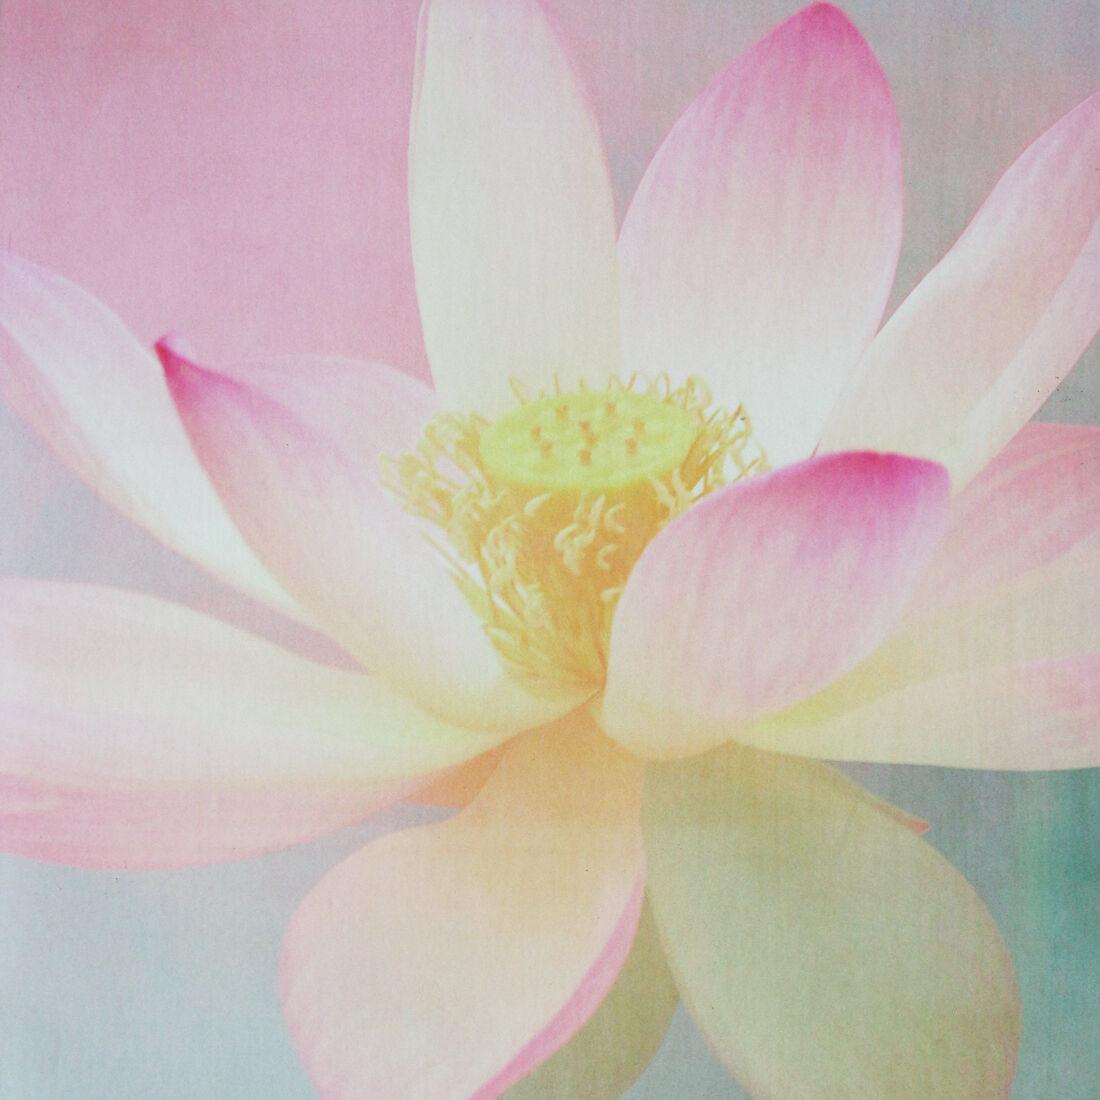 Premium Yoga Mat – Supreme Eco Lotus, Eco Supreme Friendly 48a8c9